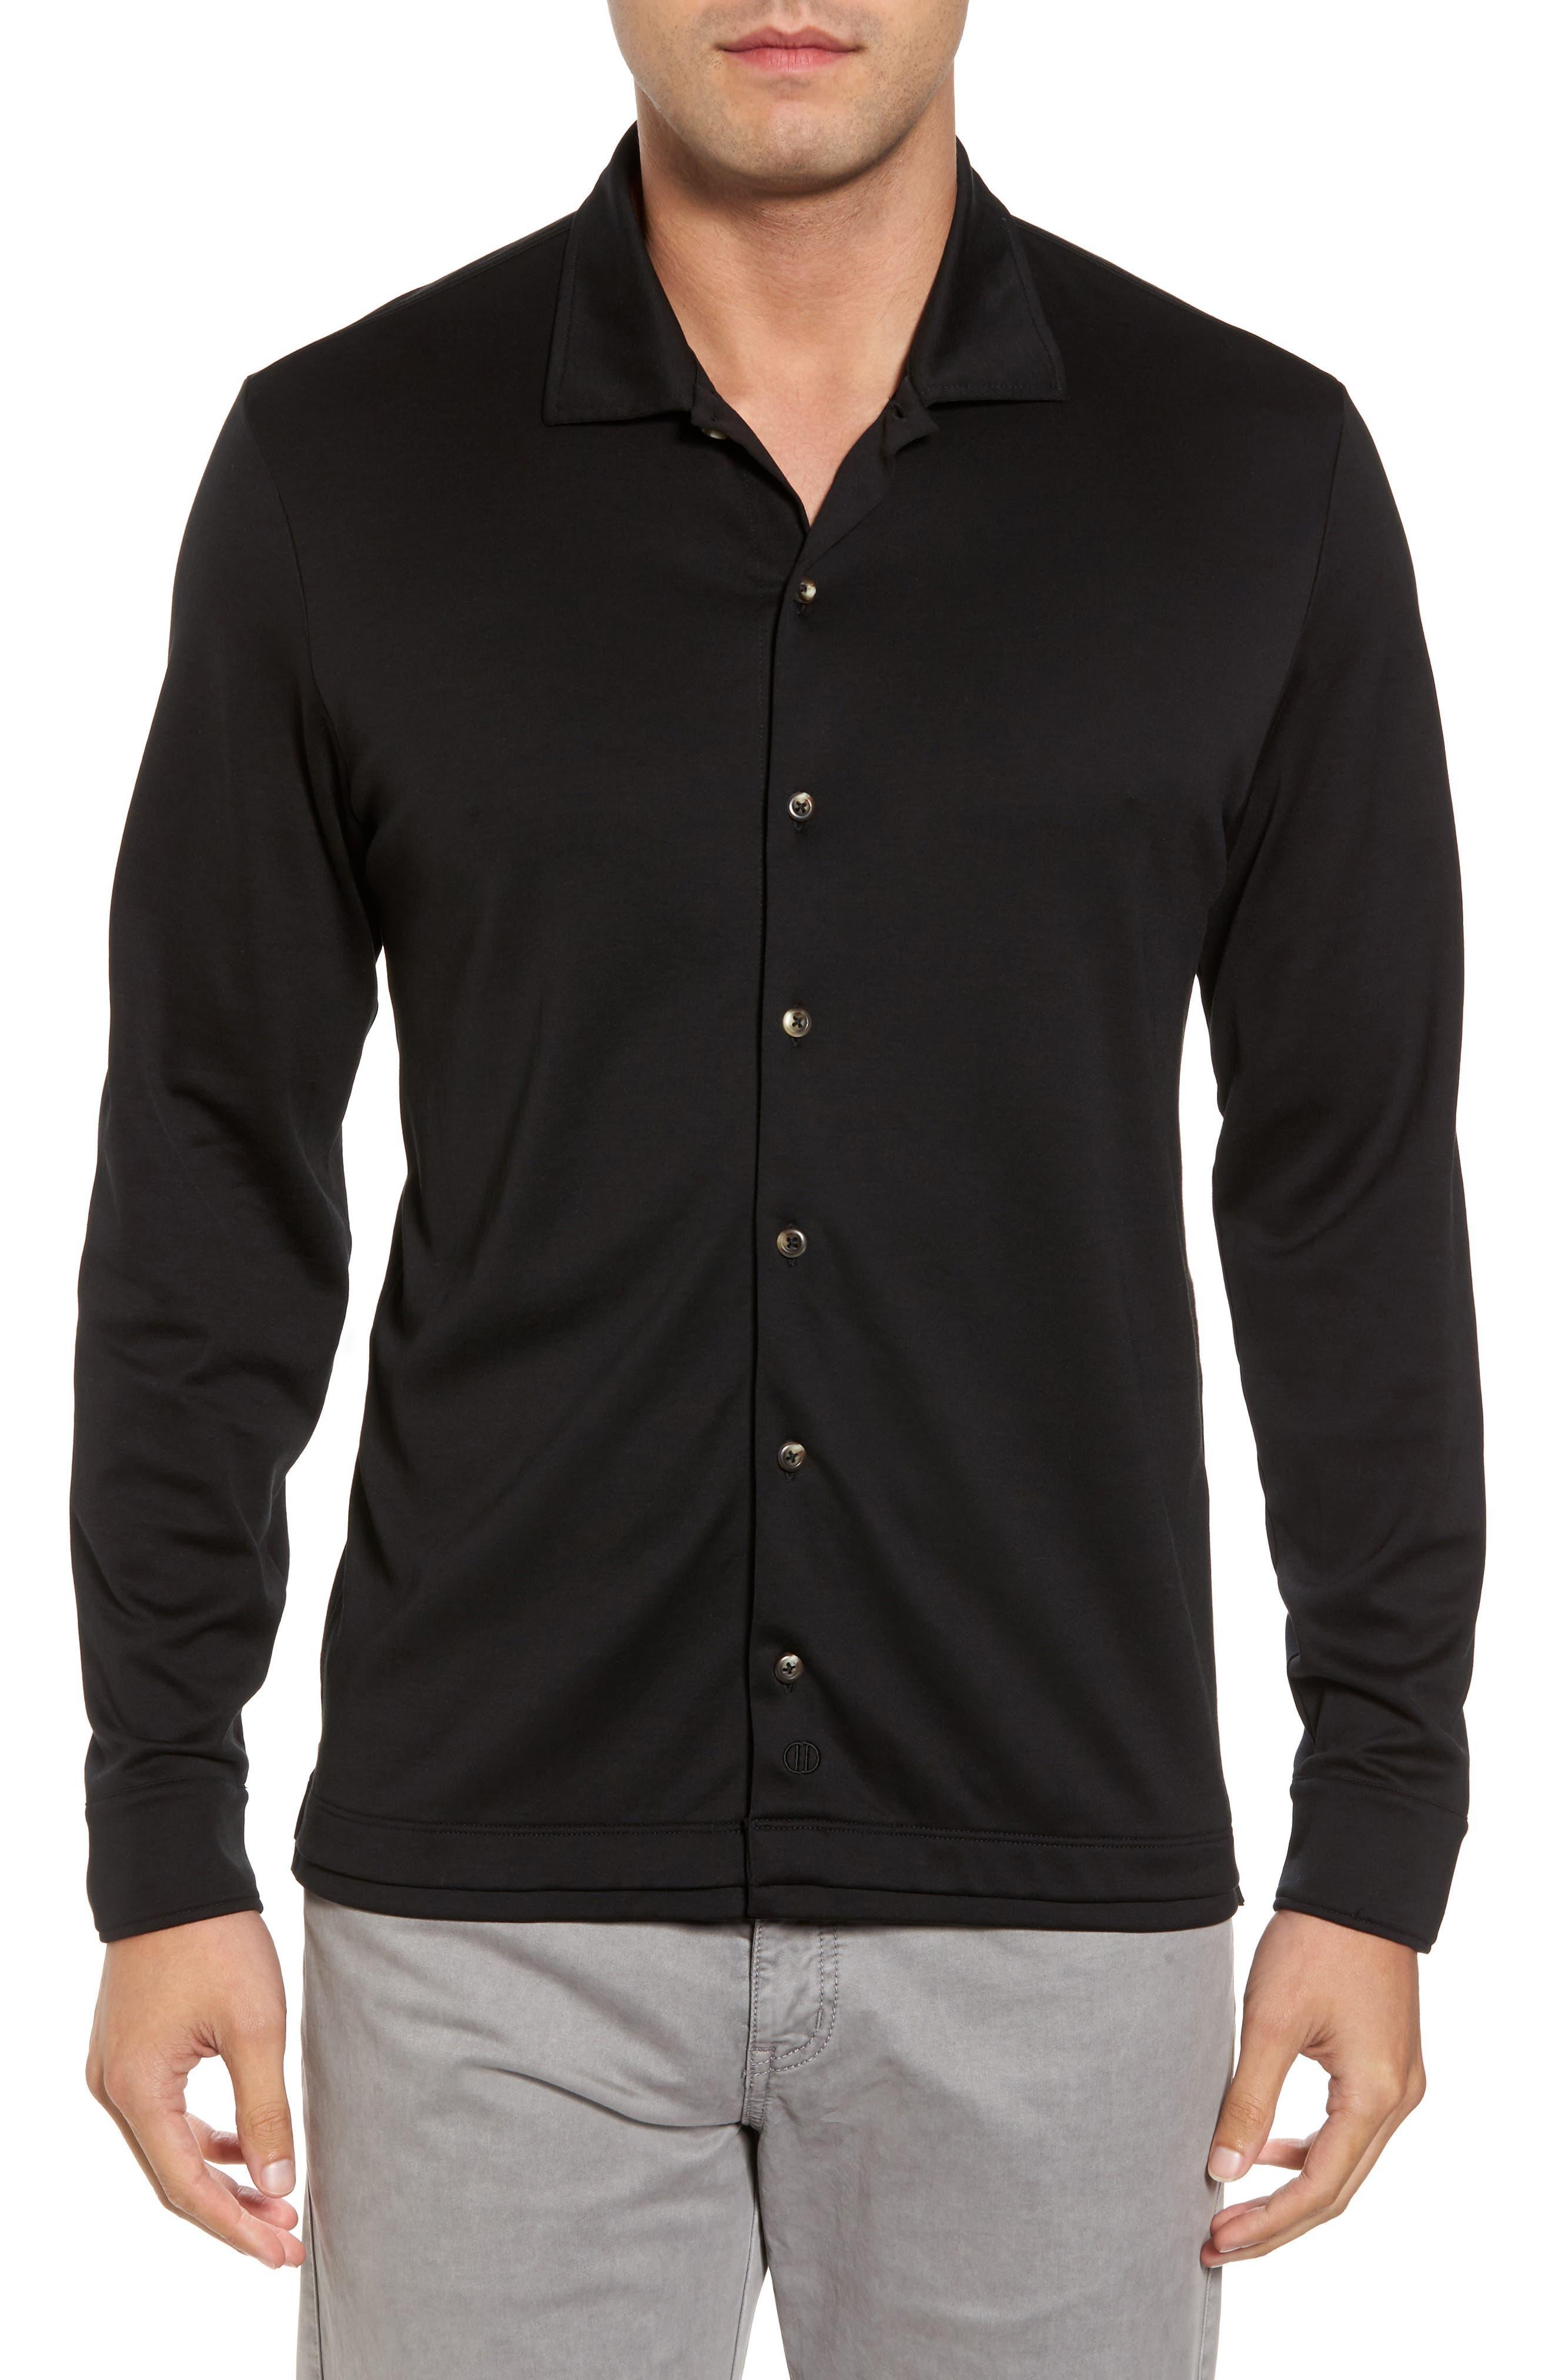 Interlock Knit Sport Shirt,                             Main thumbnail 1, color,                             002